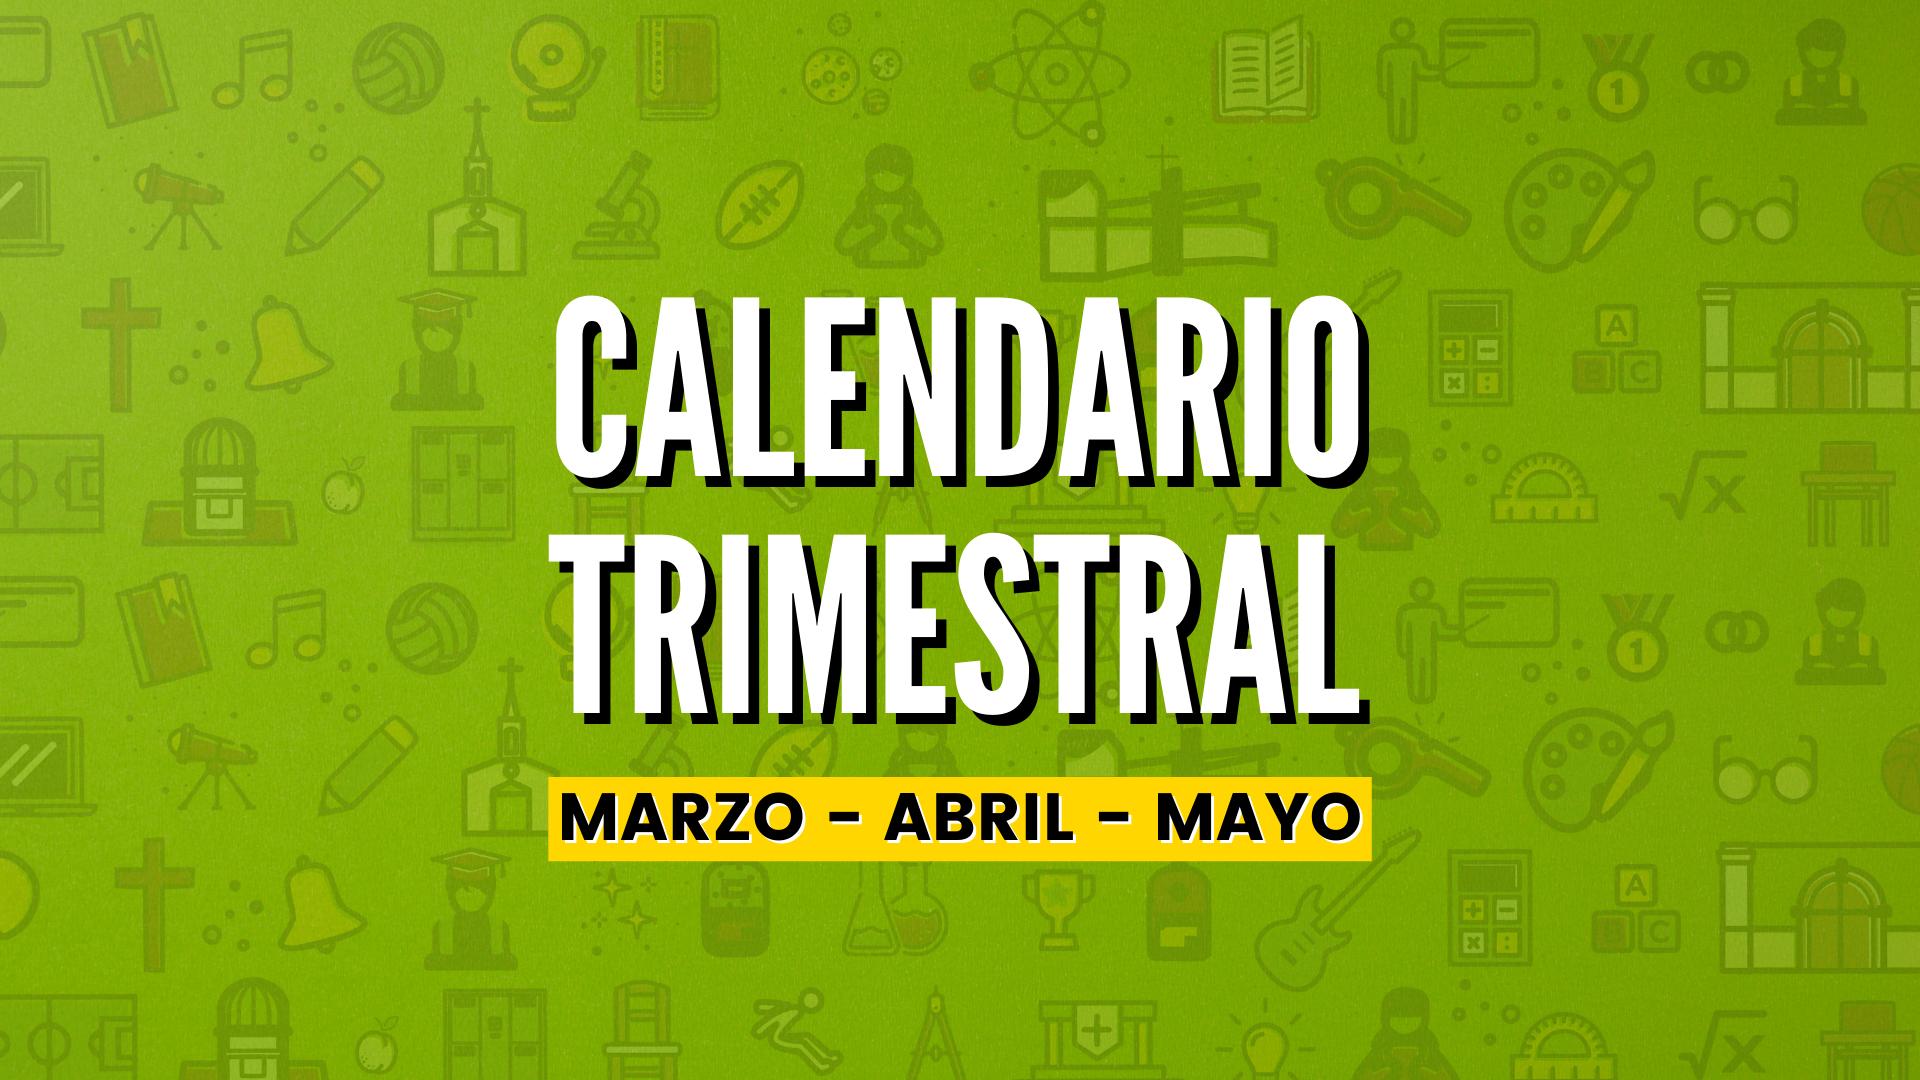 CALENDARIO TRIMESTRAL MAR-ABR-MAY